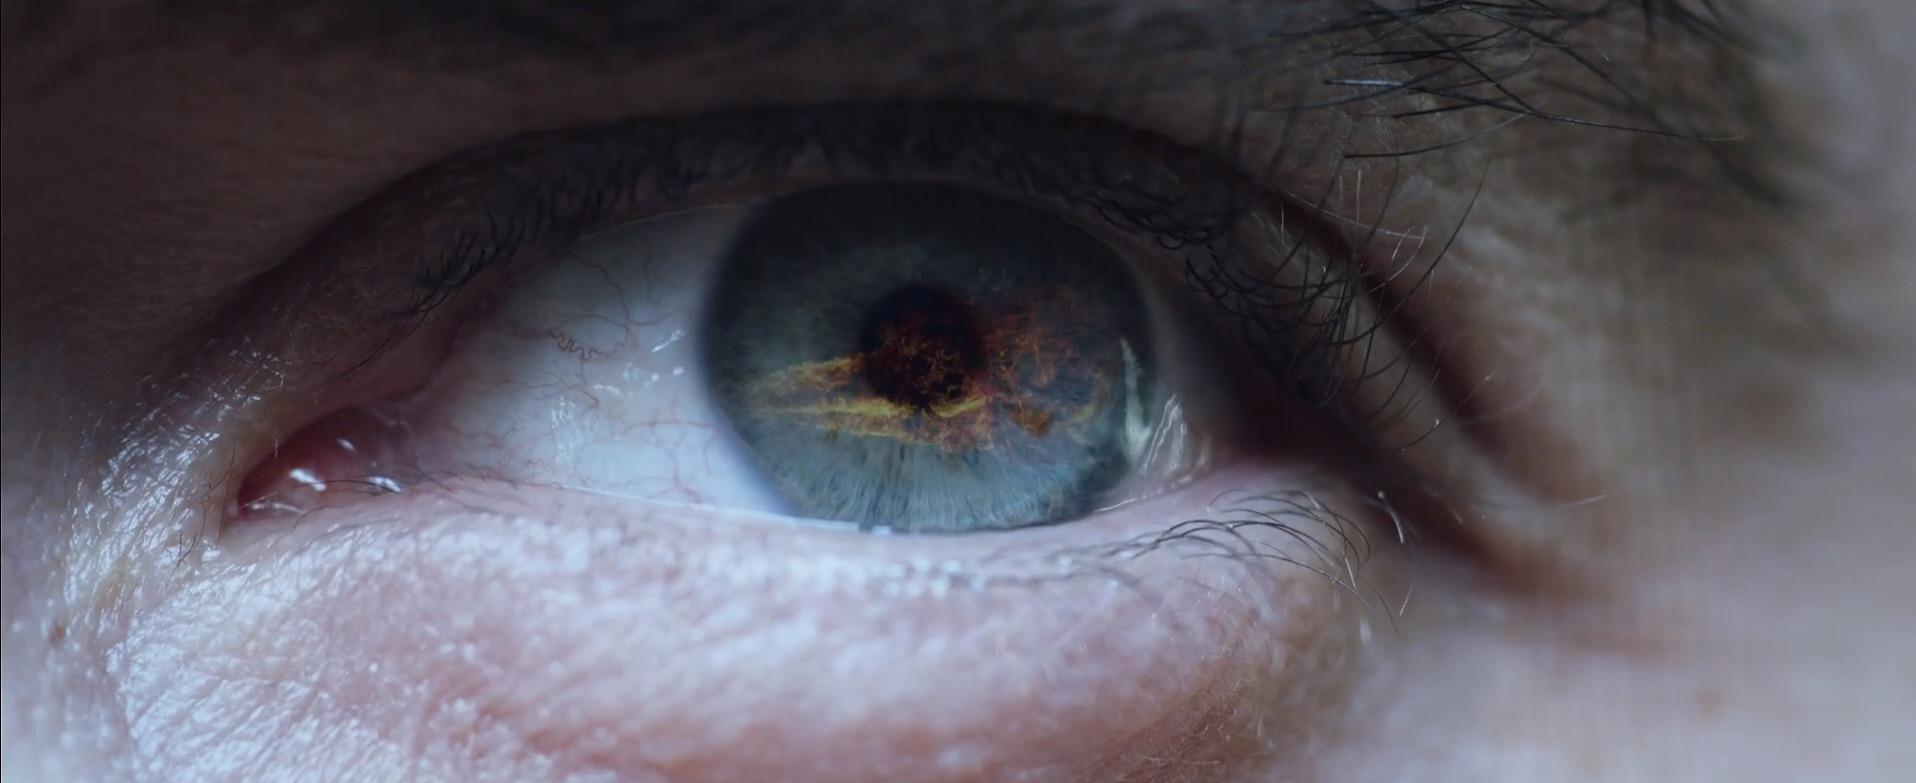 eyes close-up indoor organ iris blood vessel